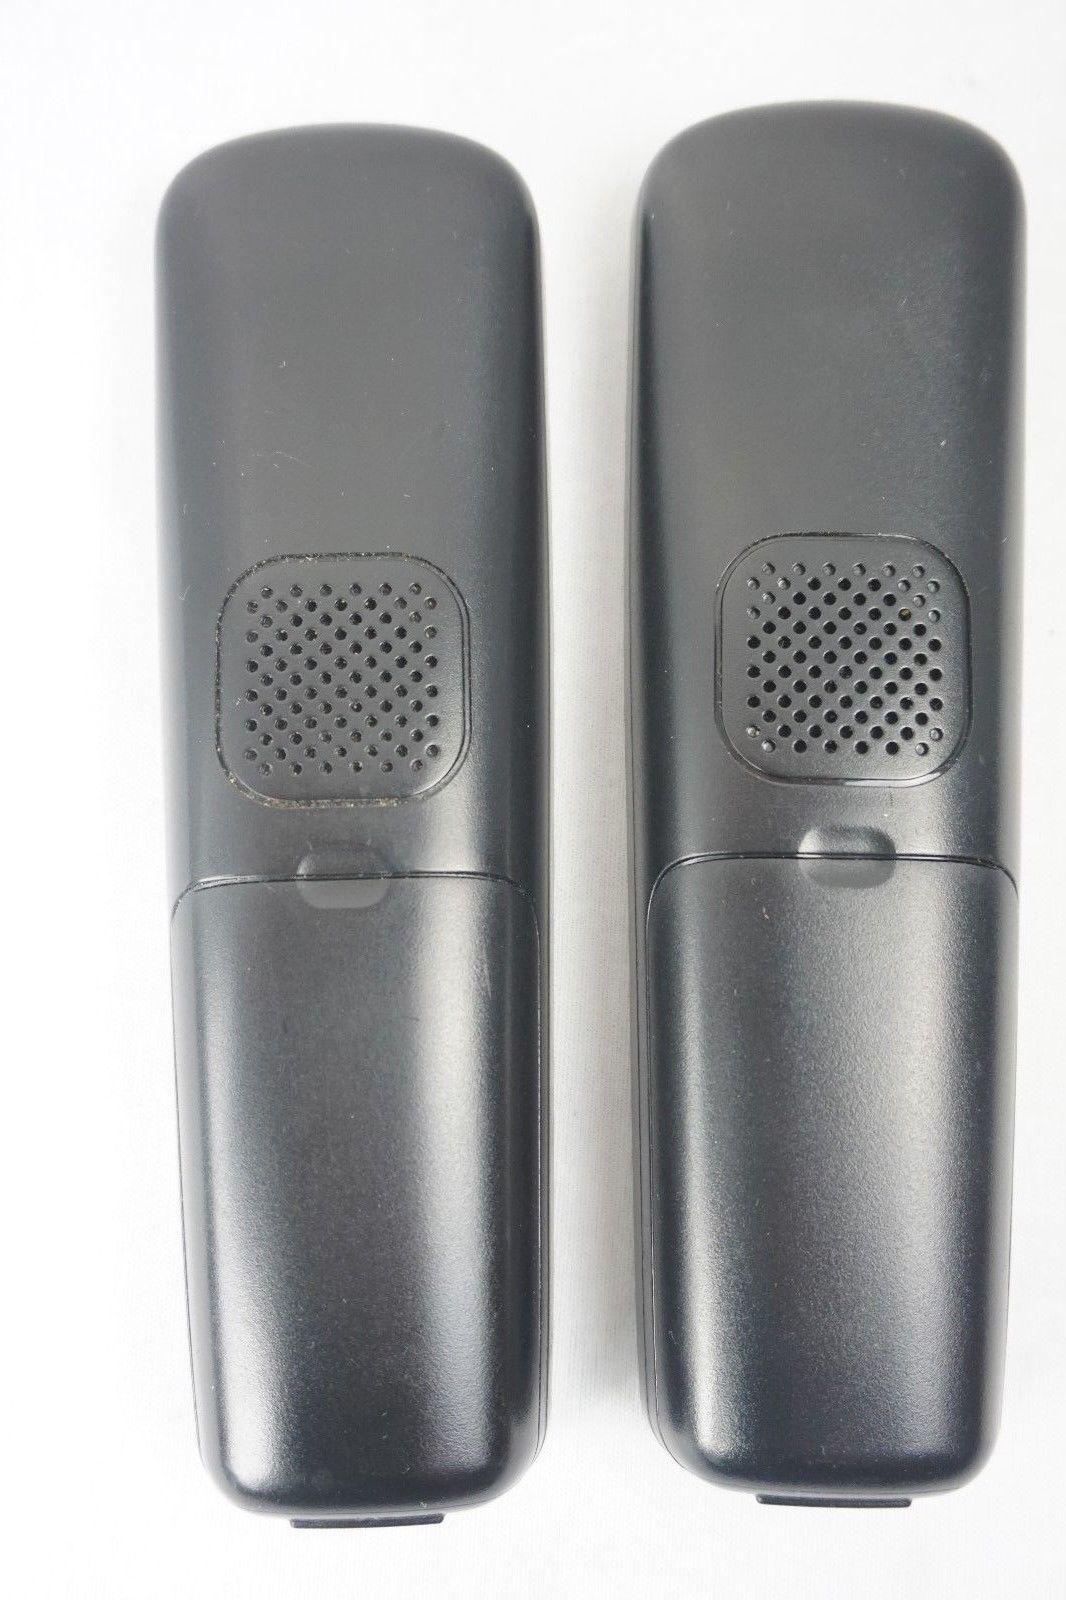 Uniden D1680-3 DECT 6.0 Cordless Phone Answering System 3 Handsets Expandable image 8